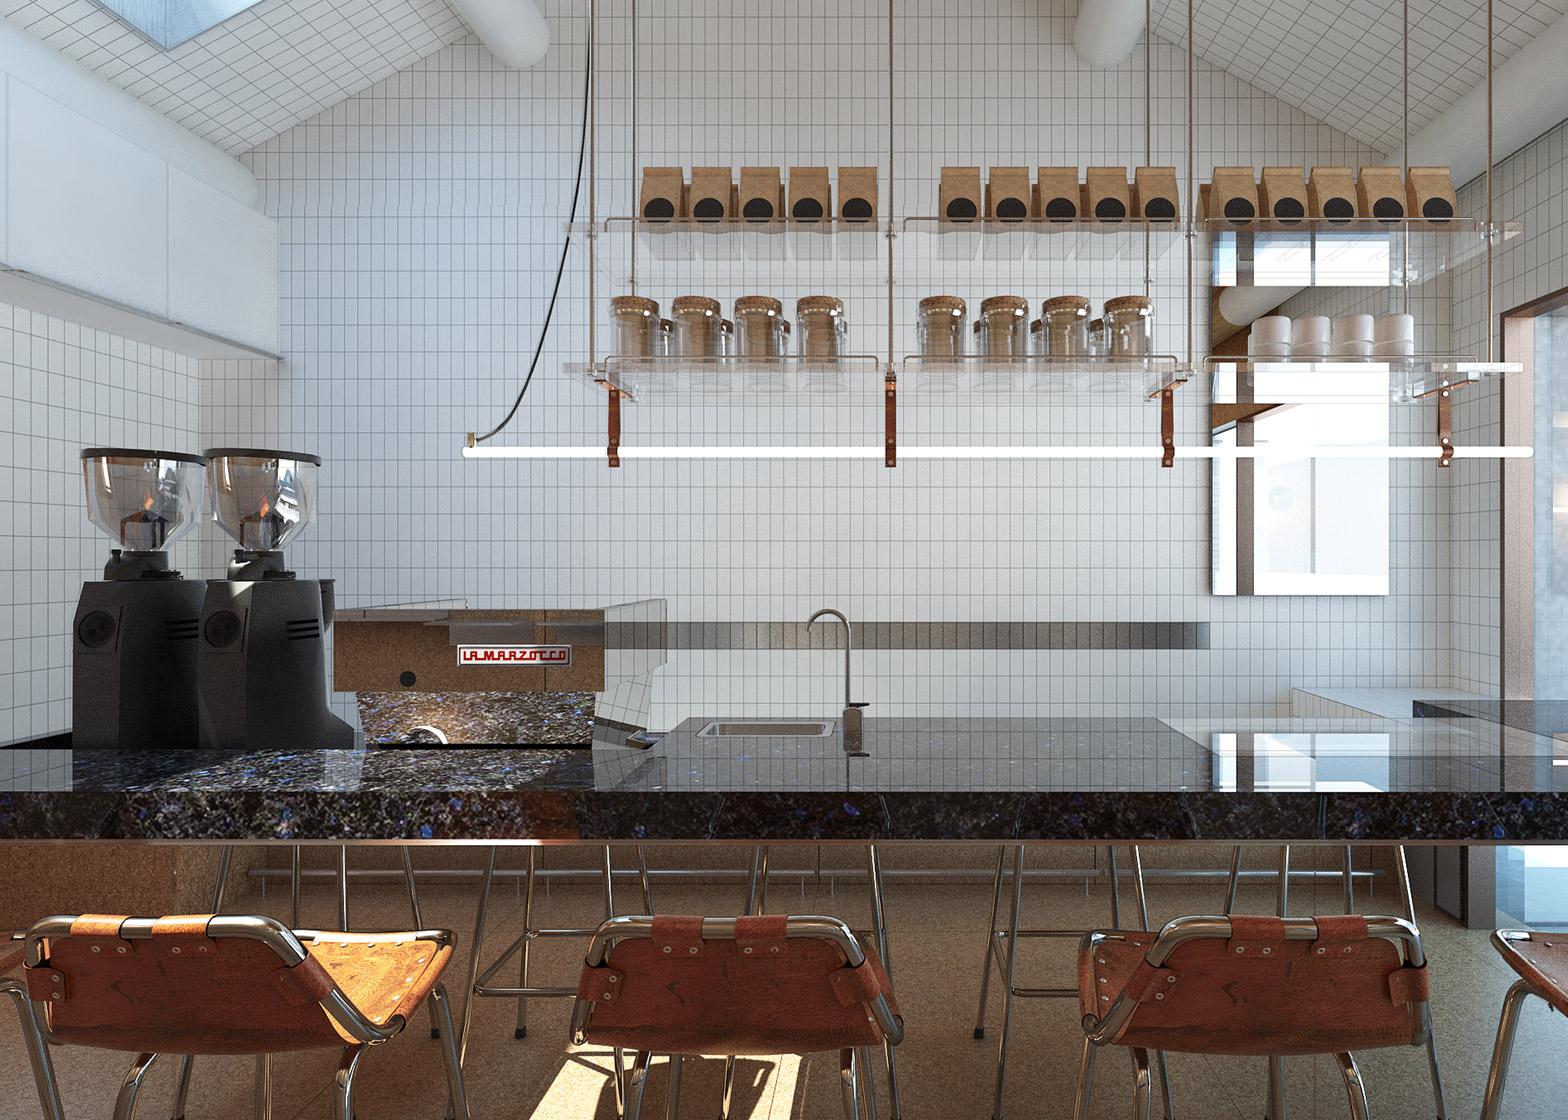 big-small-coffee-bar-b-and-b-guest-room-hutong-office-aio-beijing-cork-bandb-concept-spatial_dezeen_1568_0